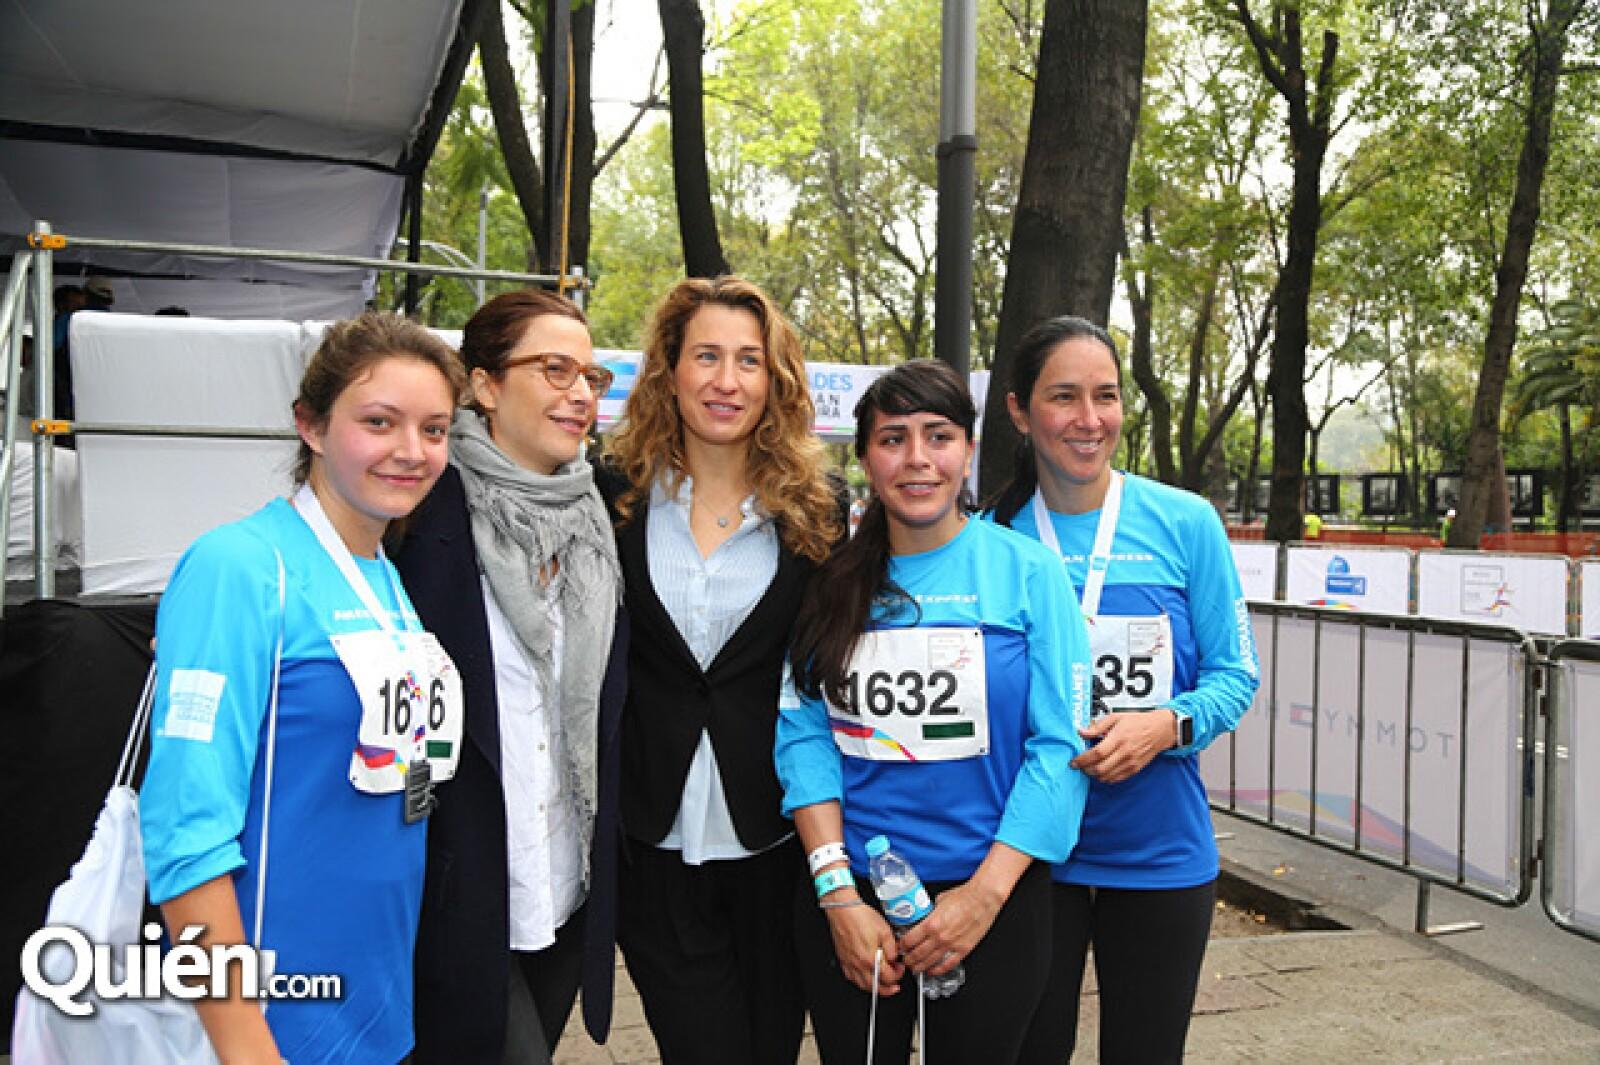 Paulina de la Paz,Amanda Echeverría,Ursula Verea,Ana Paula Pérez y Cynthia Gutiérrez